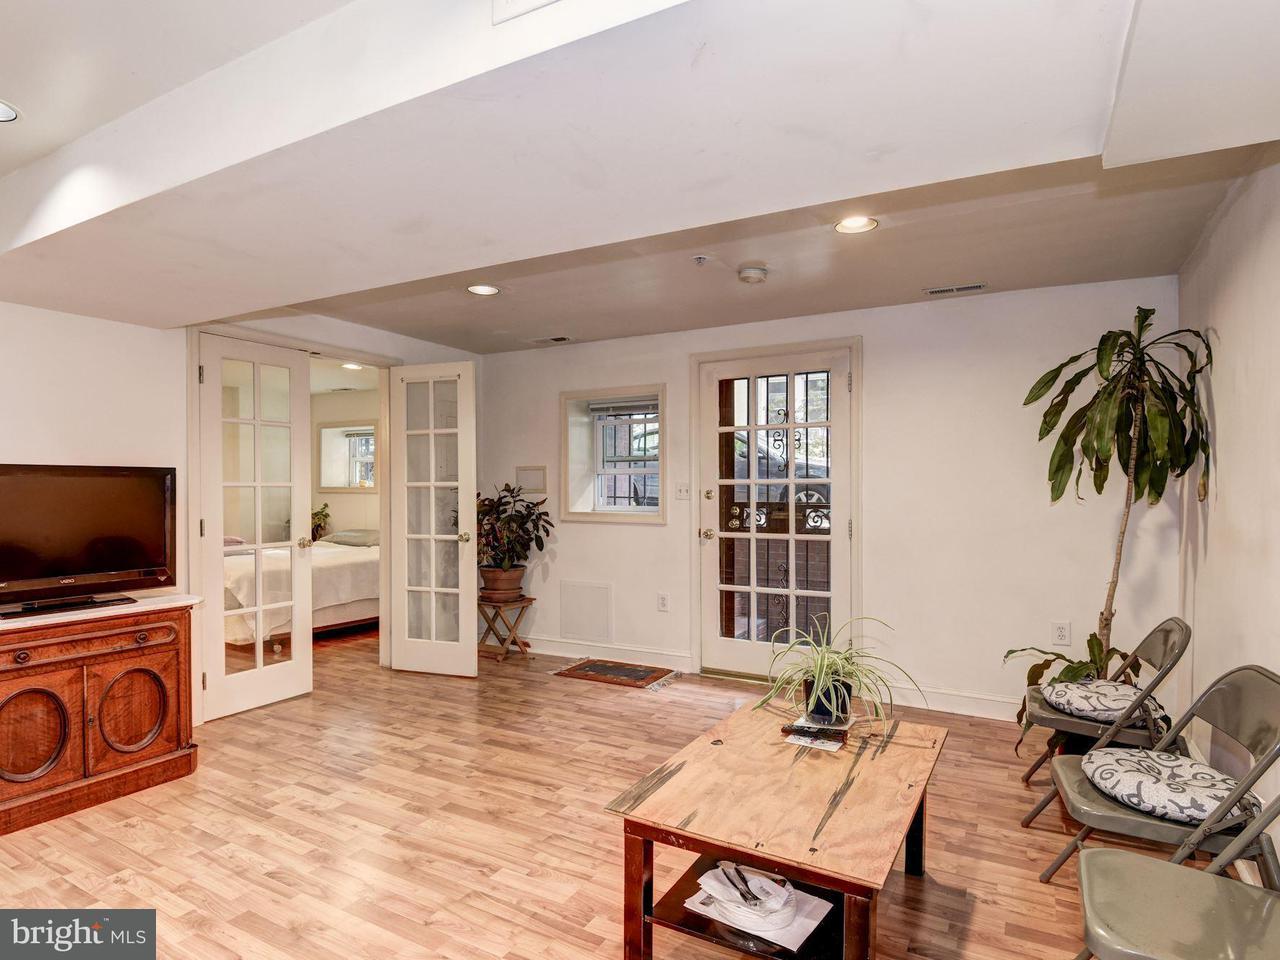 Additional photo for property listing at 2303 17th St Nw 2303 17th St Nw Washington, Distrito De Columbia 20009 Estados Unidos